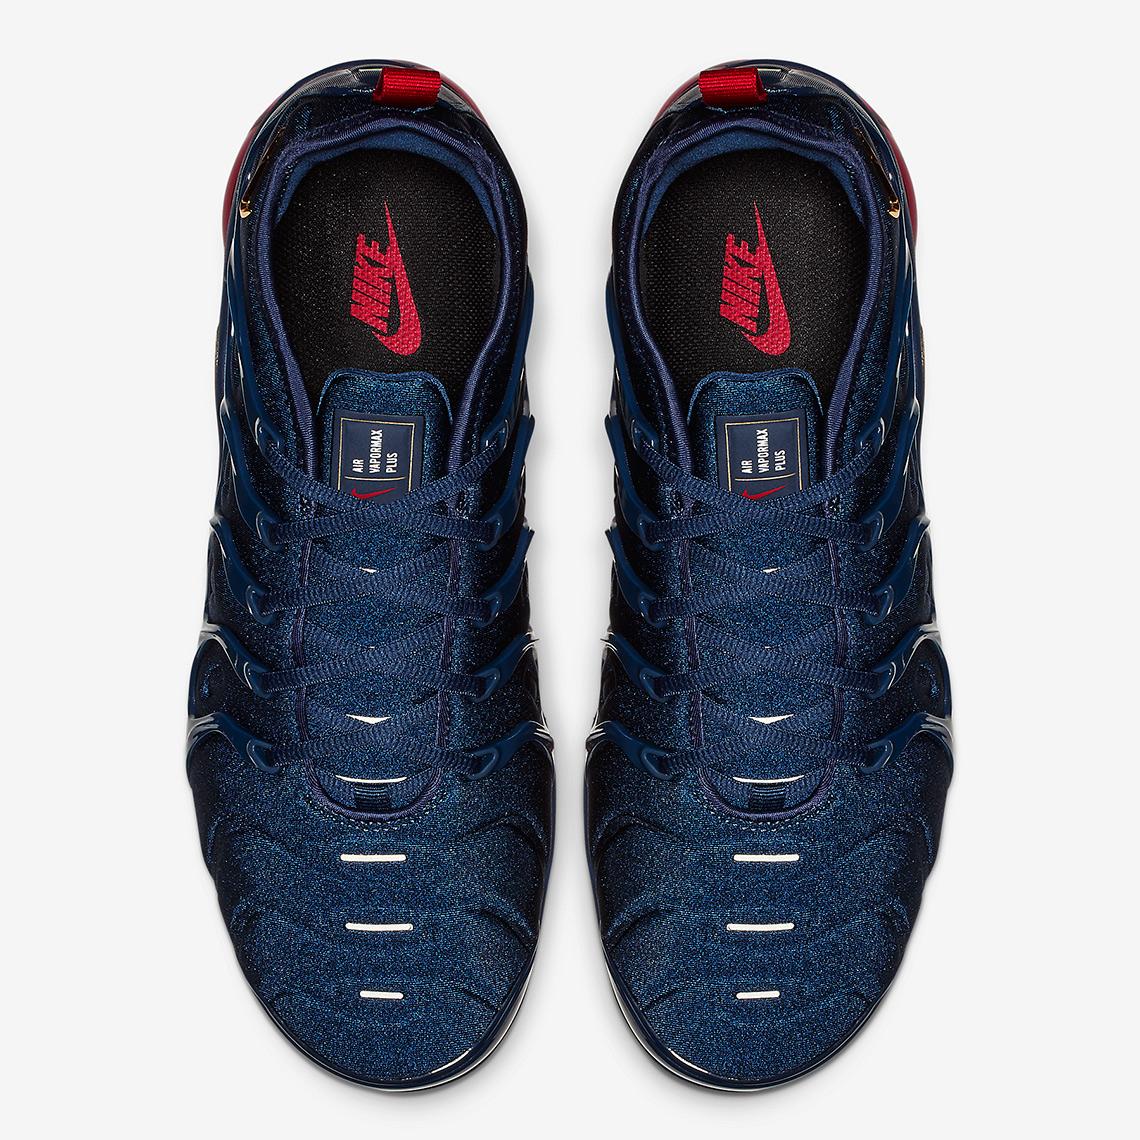 05a887b8fa2 Nike Vapormax Plus Olympic 924453-405 Release Info